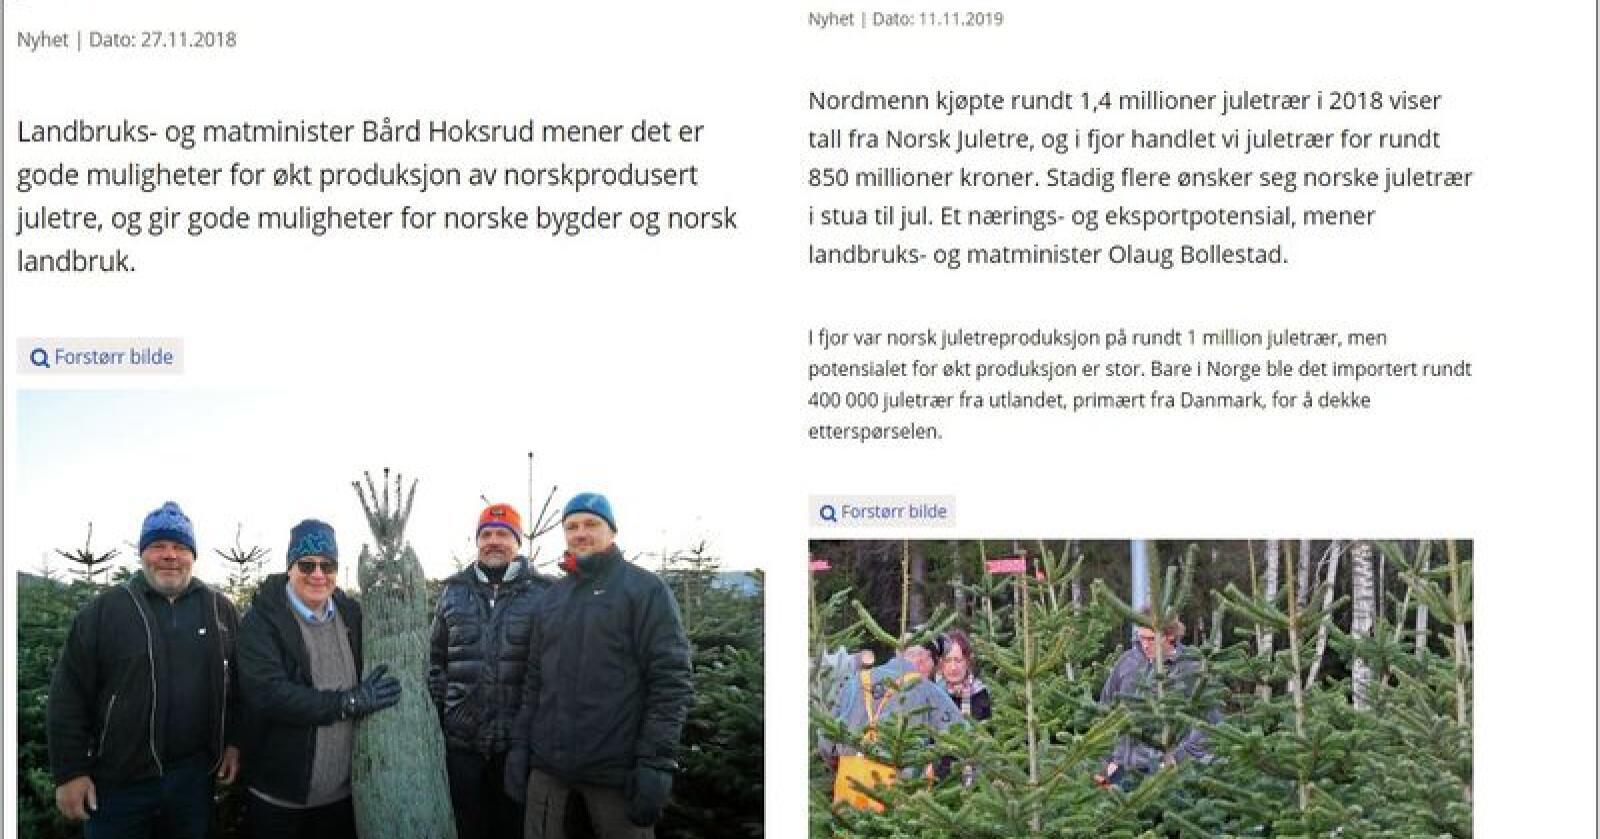 To år på rad har Landbruks- og matdepartementet lagd nyhetsartikler om at statsråden vil ha flere juletrær. Faksimile: regjeringen.no